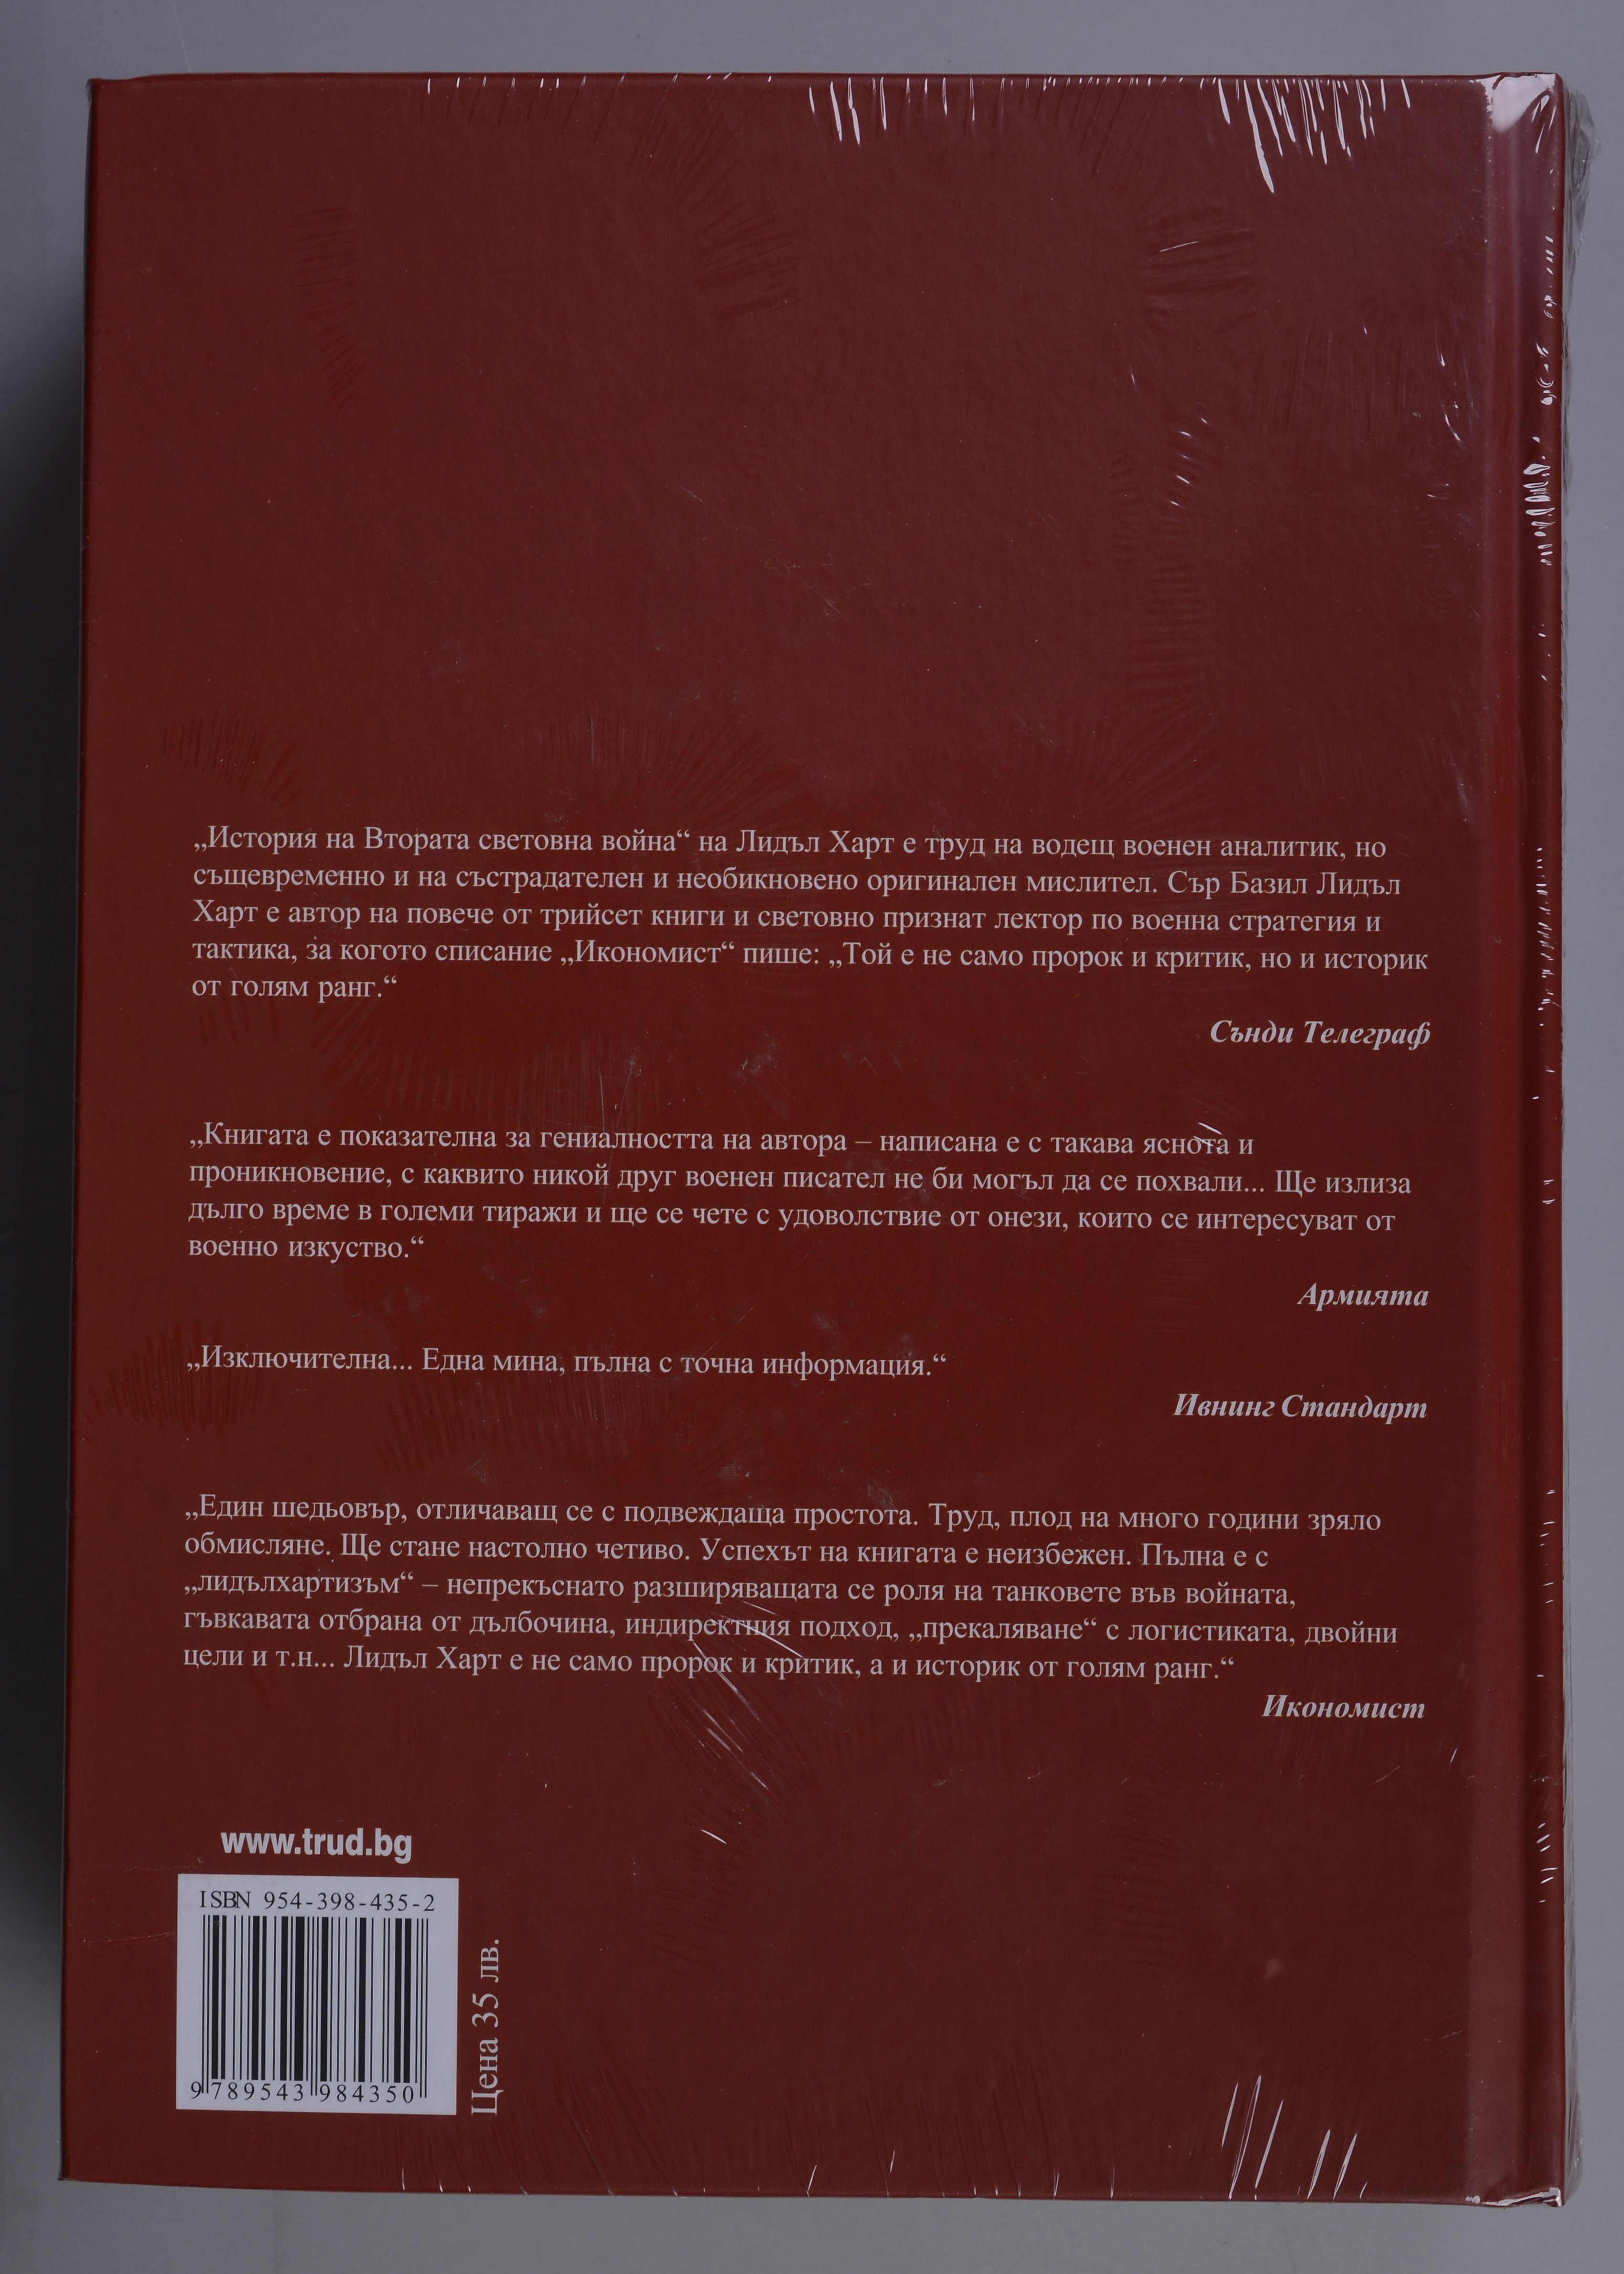 istorija-na-vtorata-svetovna-vojna-tv-rdi-korici-1 - 2